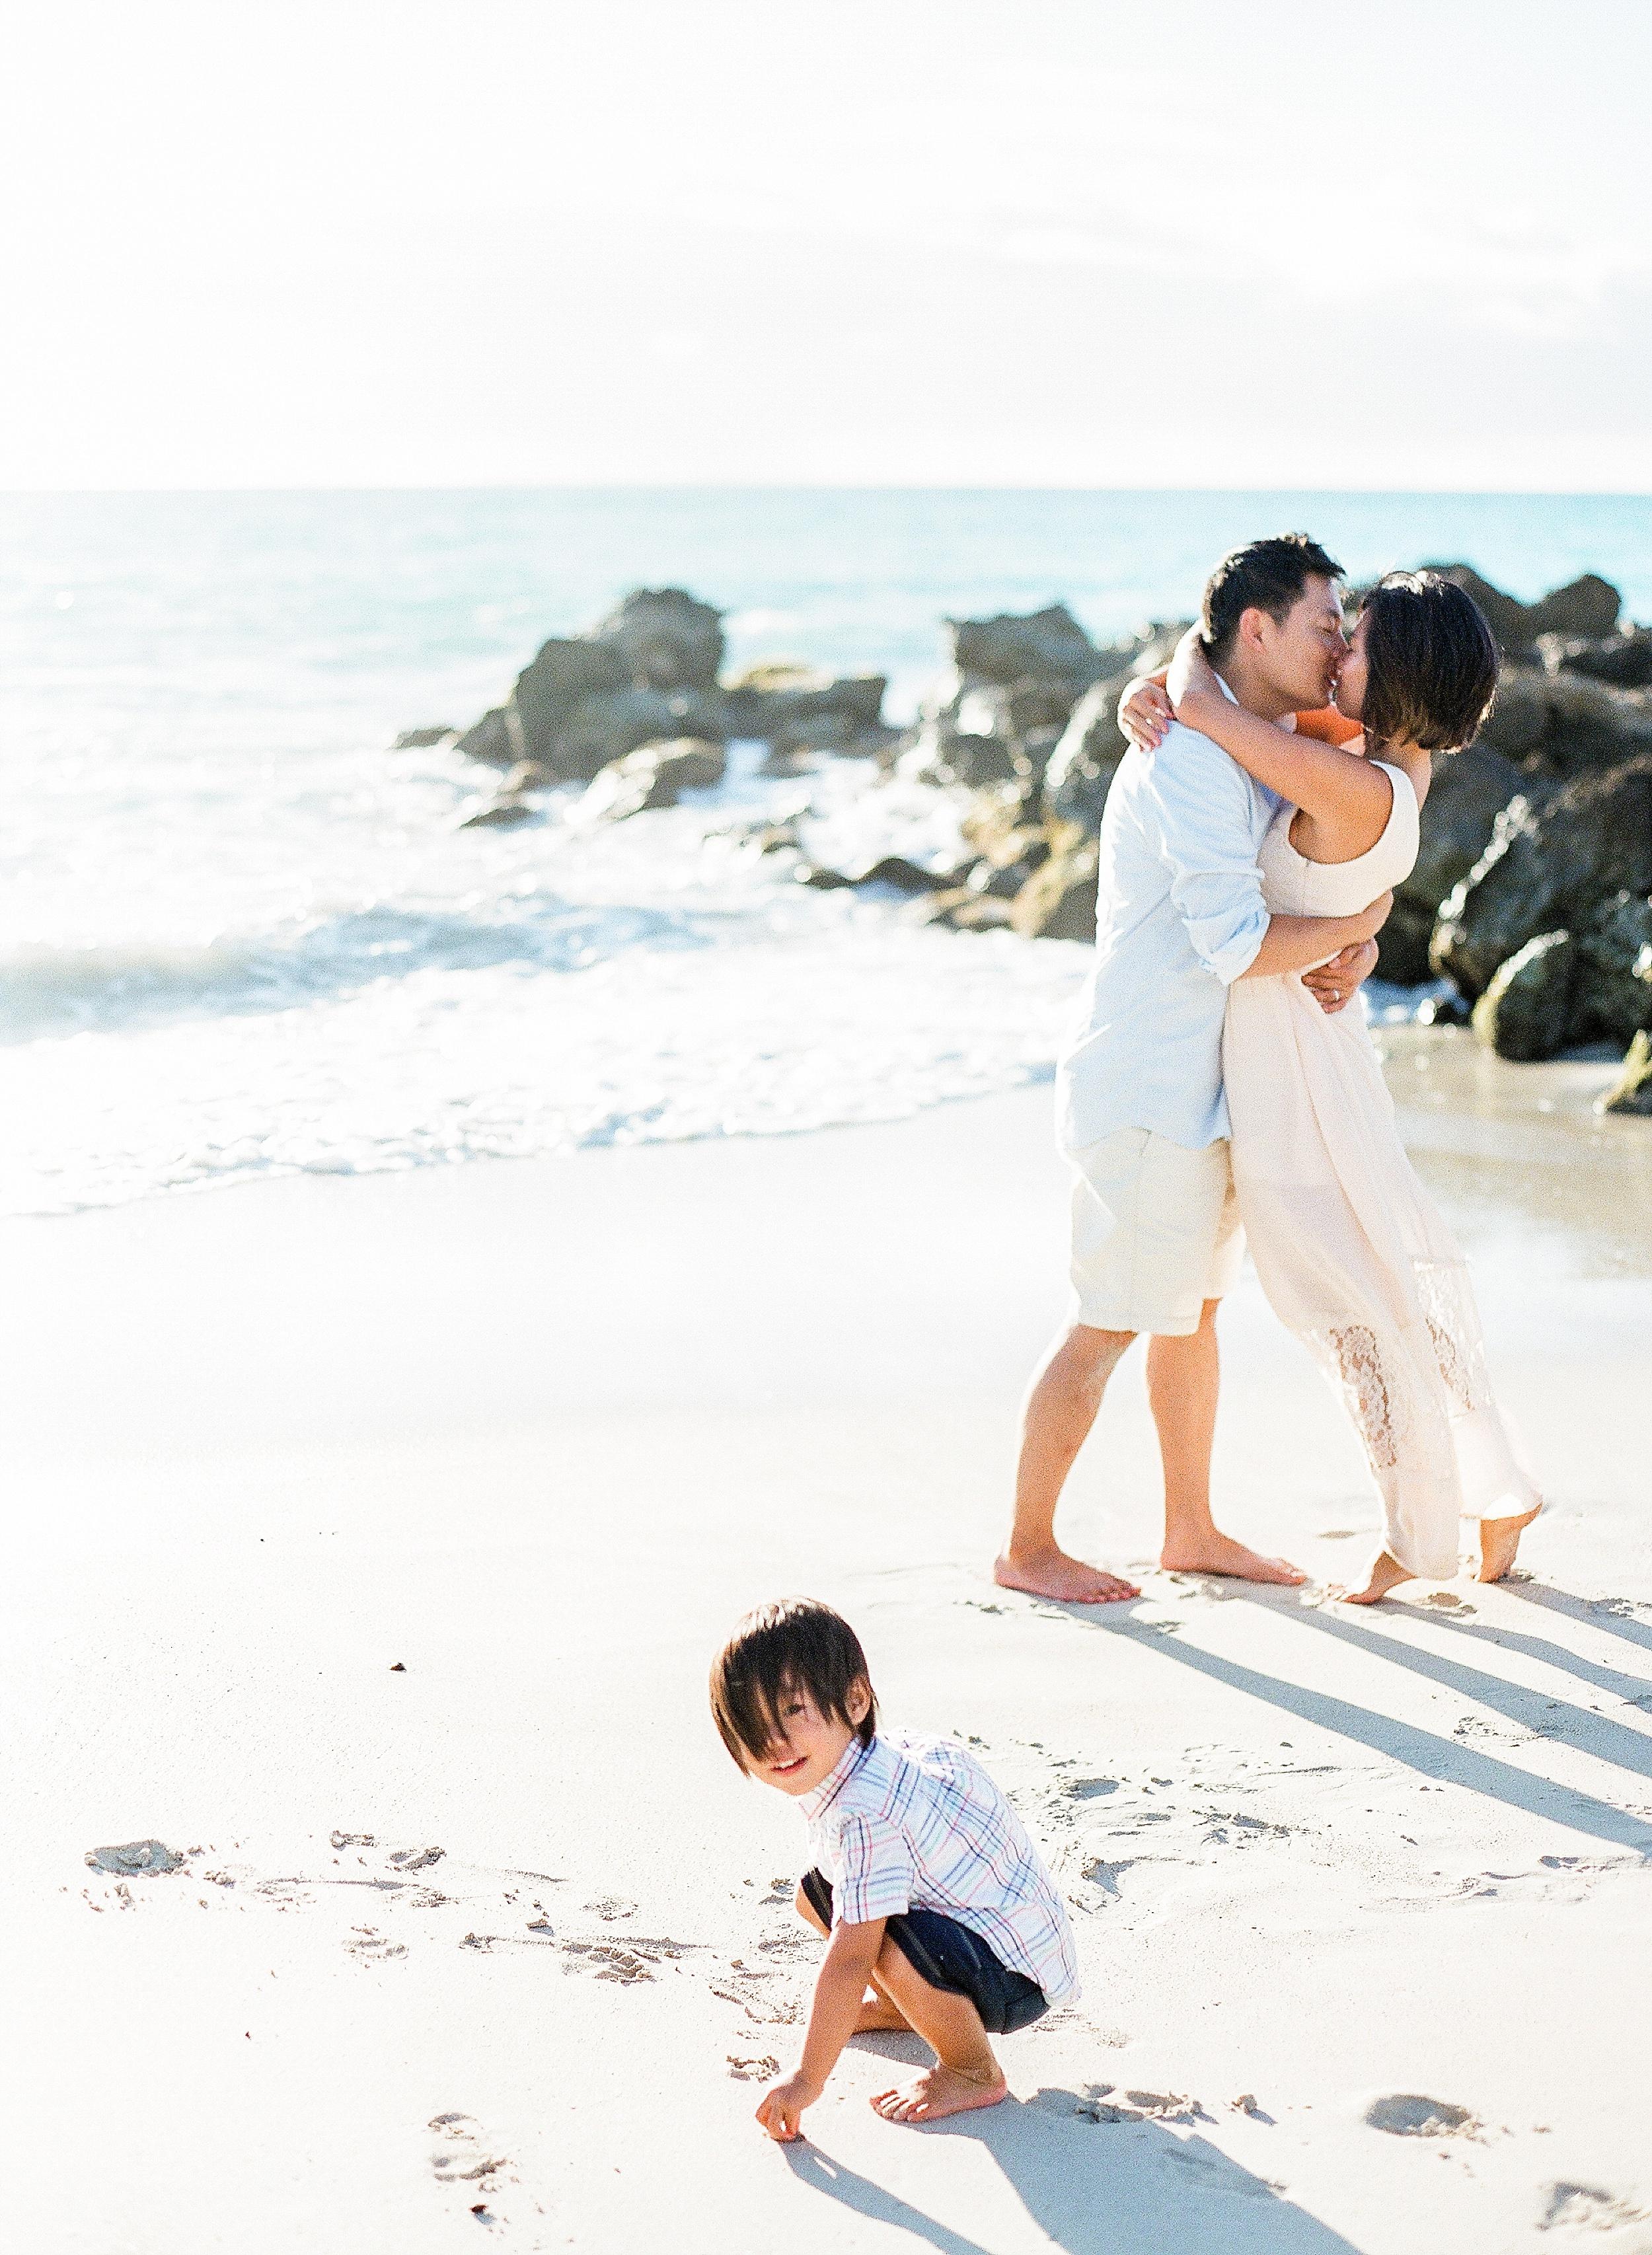 Caroline Tran Hawaii Family Photo